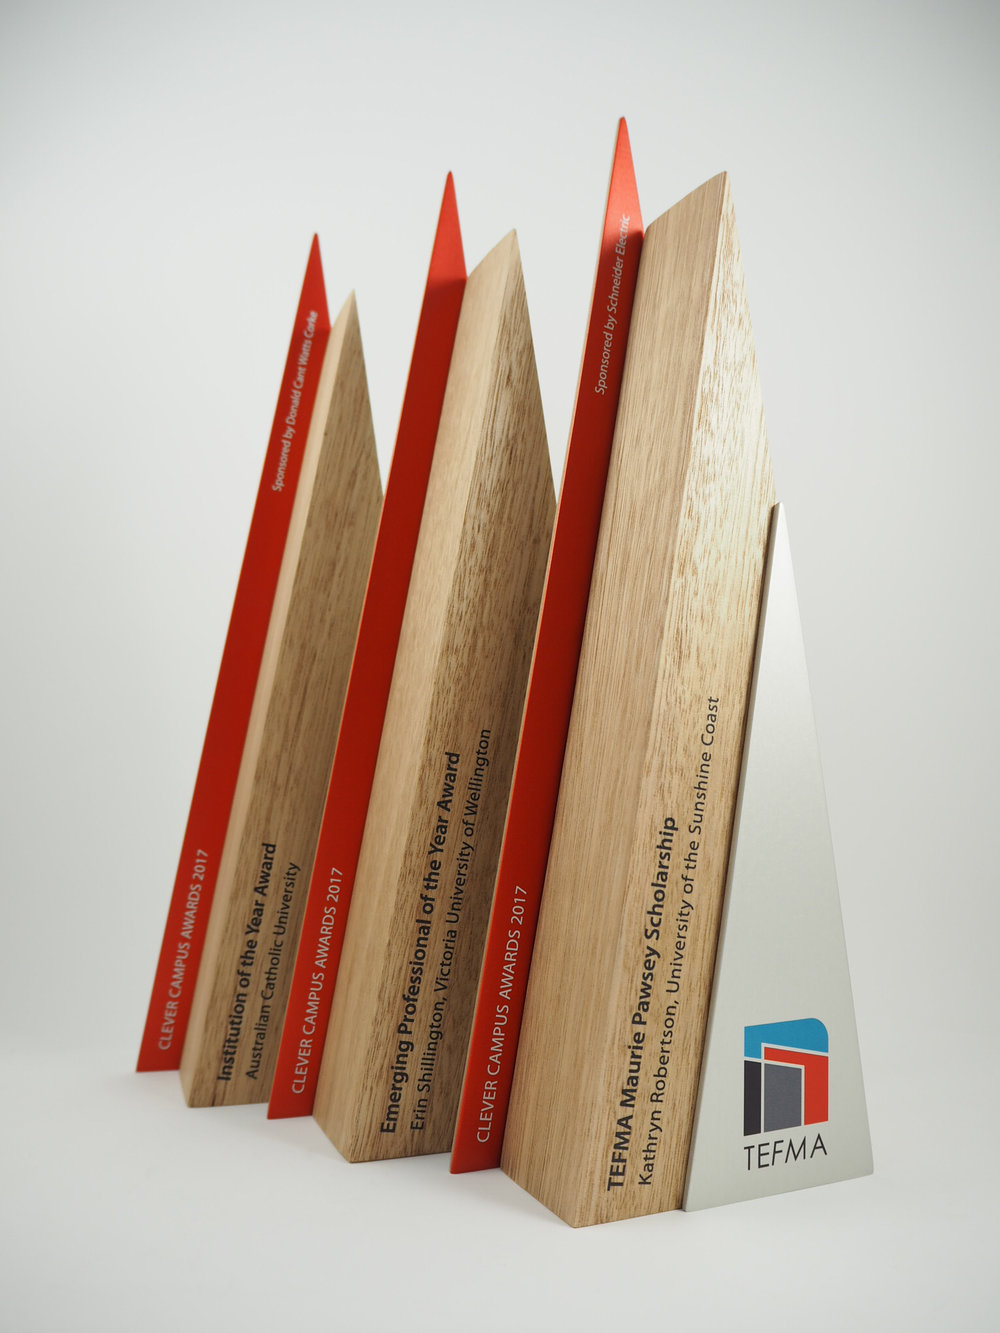 tefma-awards-timber-eco-aluminium-trophy-01.jpg